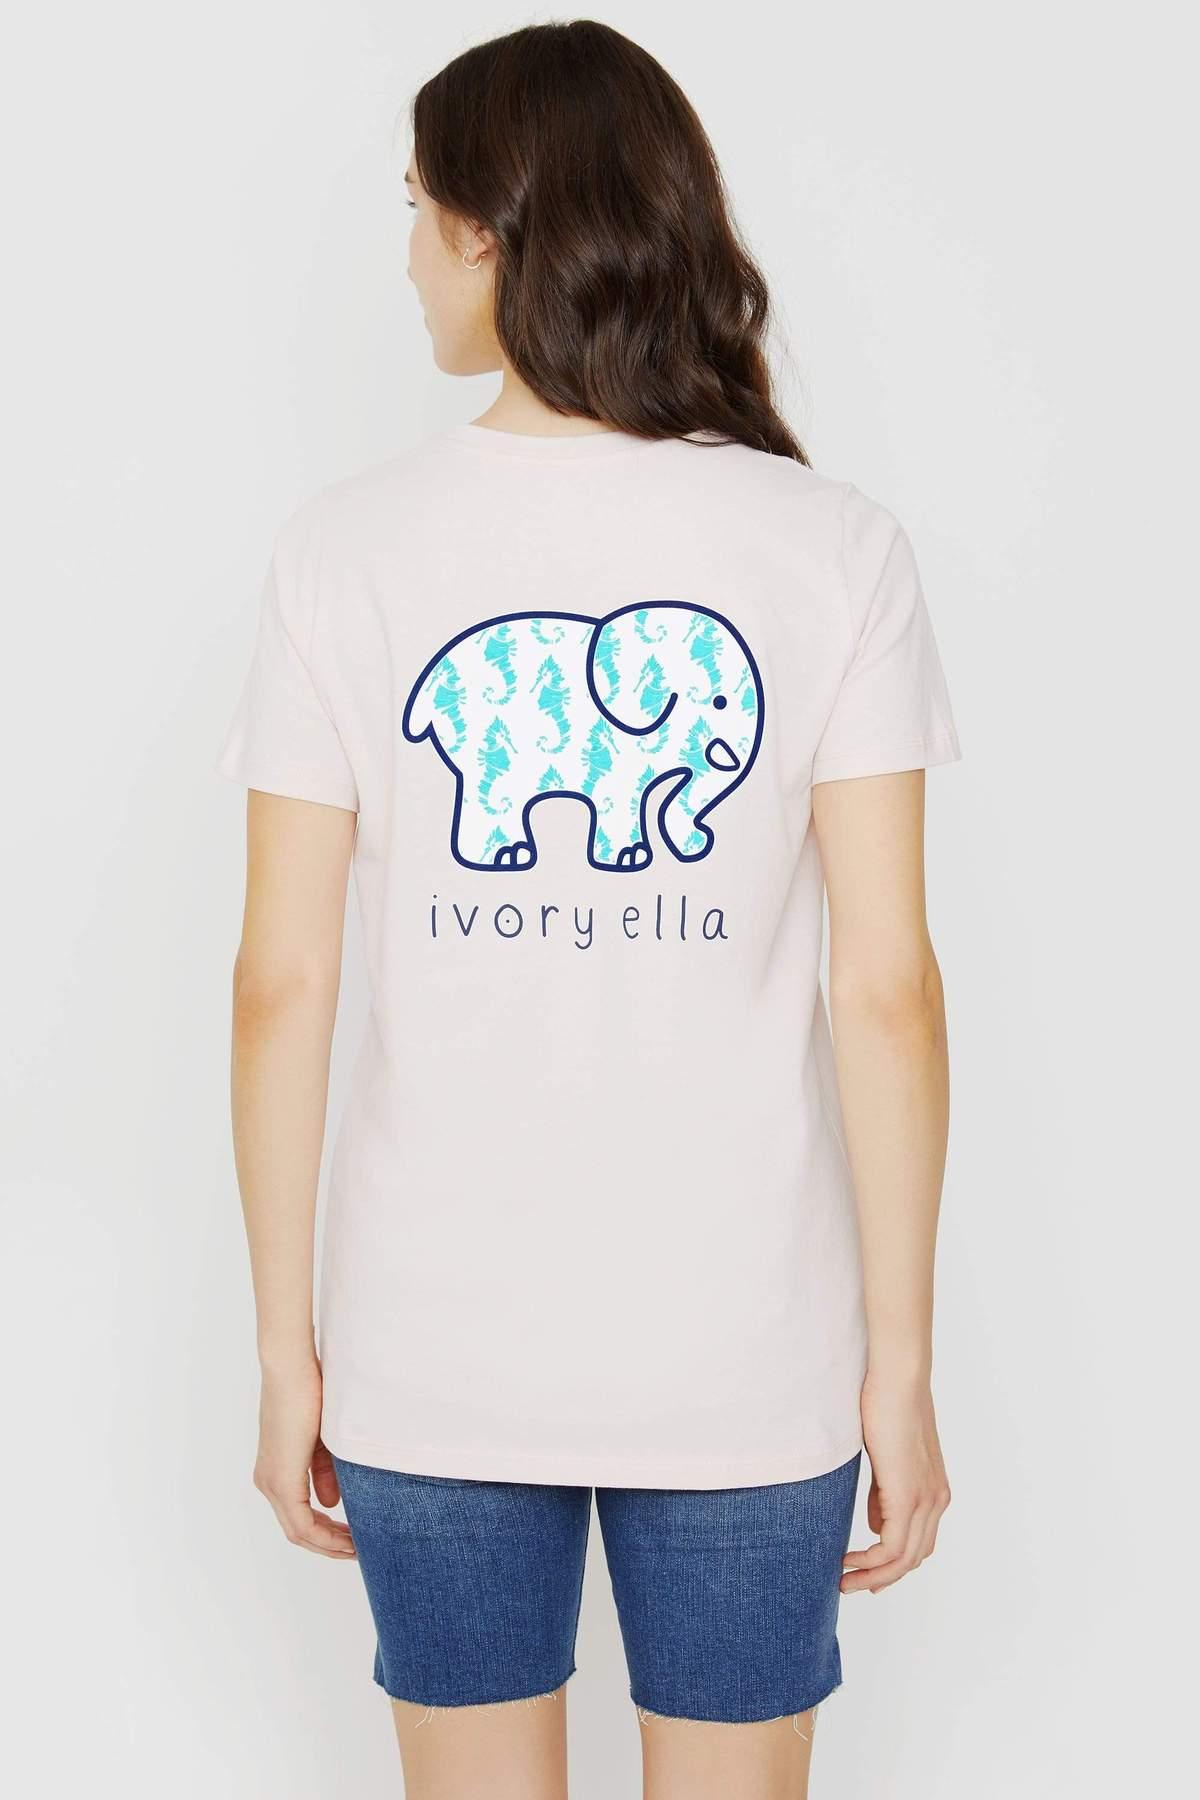 ivory-ella-women-s-short-sleeve-tees-xxs-ella-fit-crystal-pink-cat-coq-seahorse-6633346891891_1200x.jpg